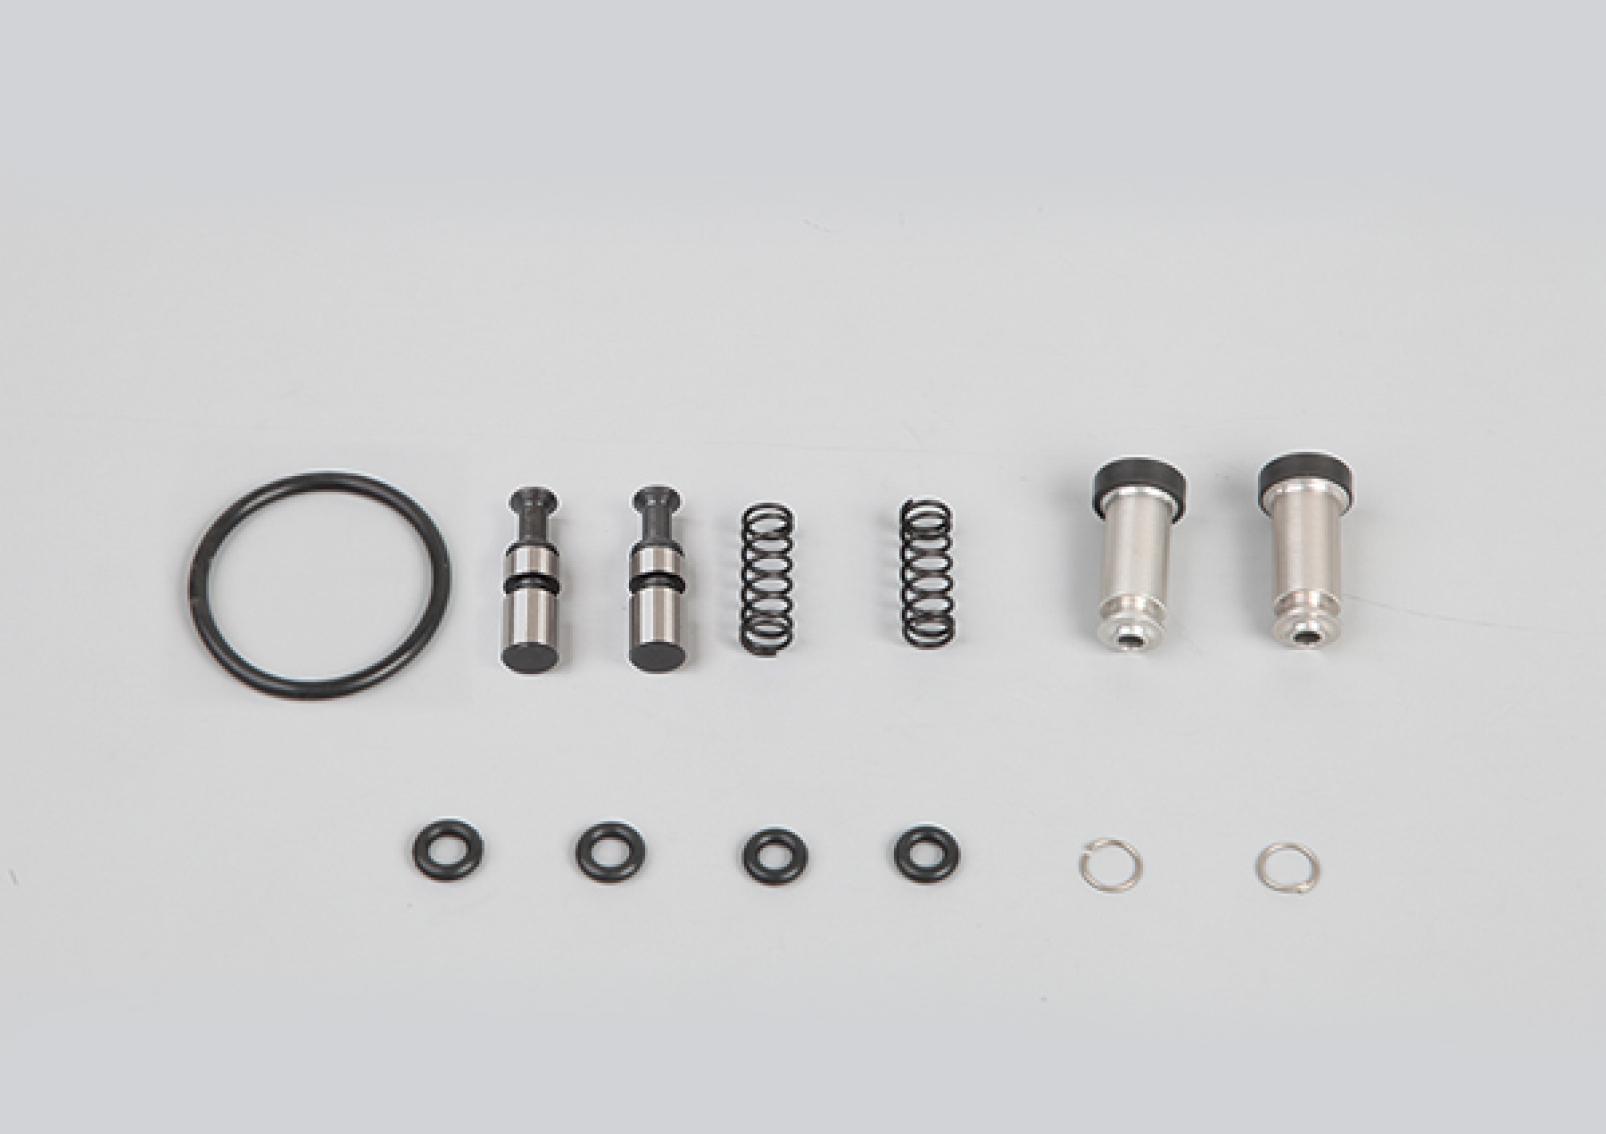 Gearbox Valve Repair Kit for Daf, 6038 202 042, 6038202042 (KIT) 6038202043 (KIT) 6038202045 (KIT)